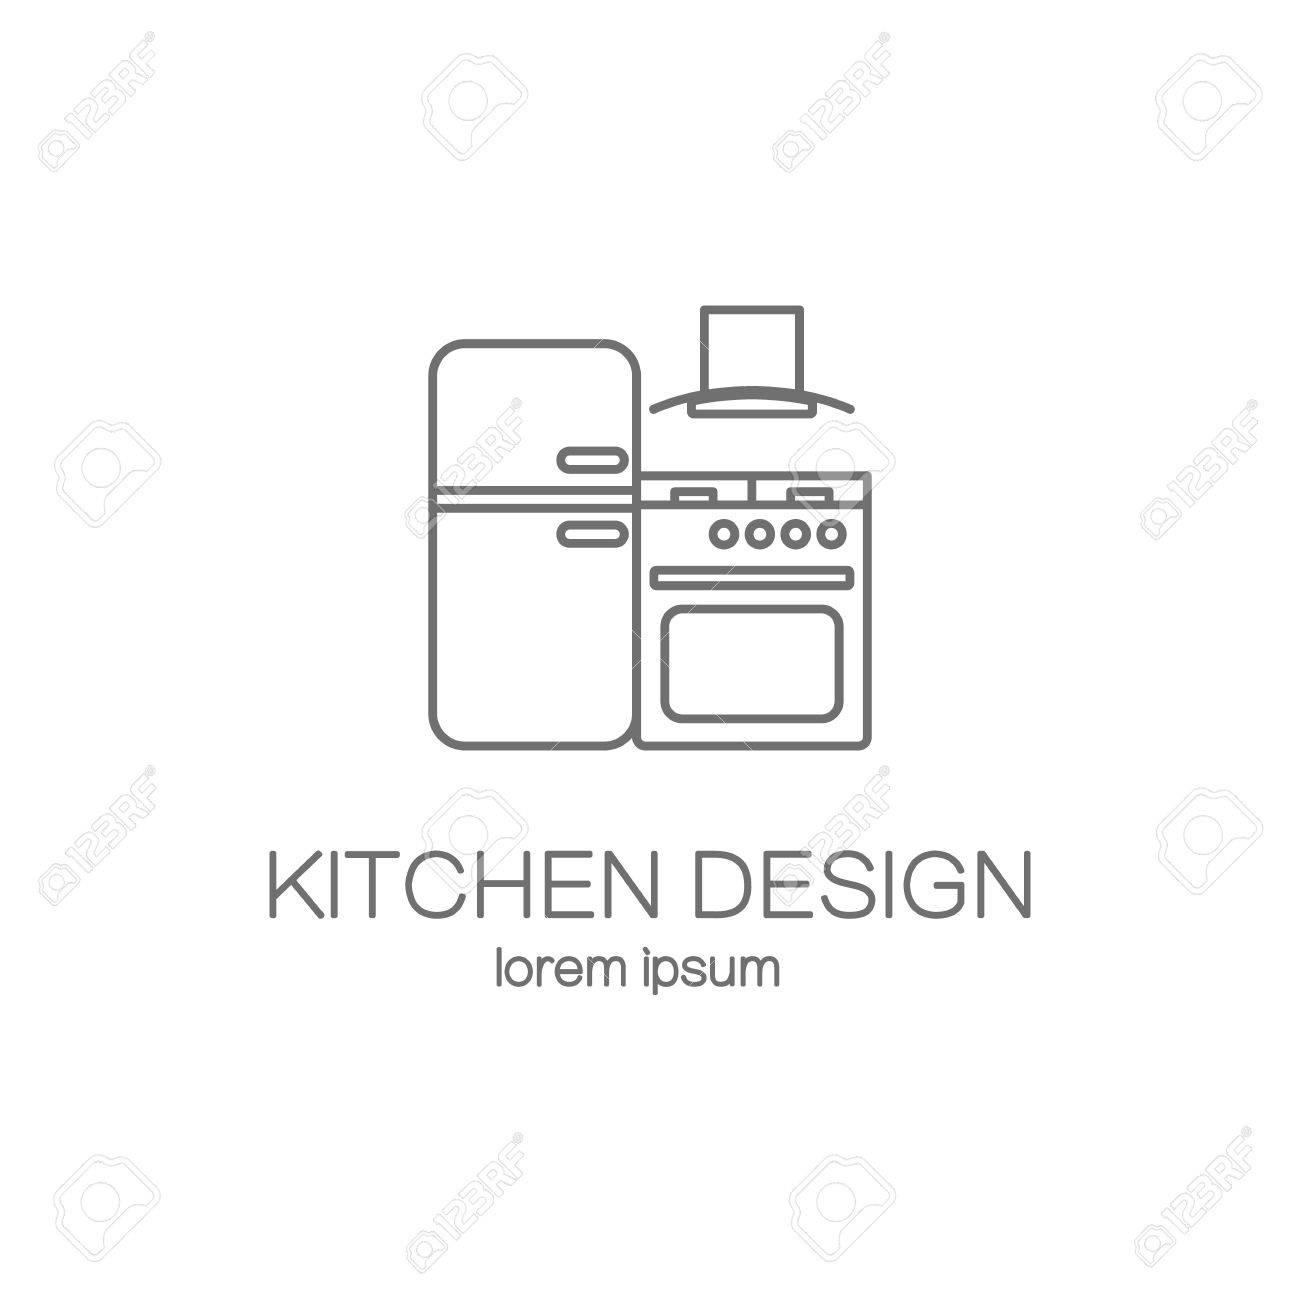 Kitchen Design Line Icon Web Logotype Templates Modern Easy To Edit Logo Template